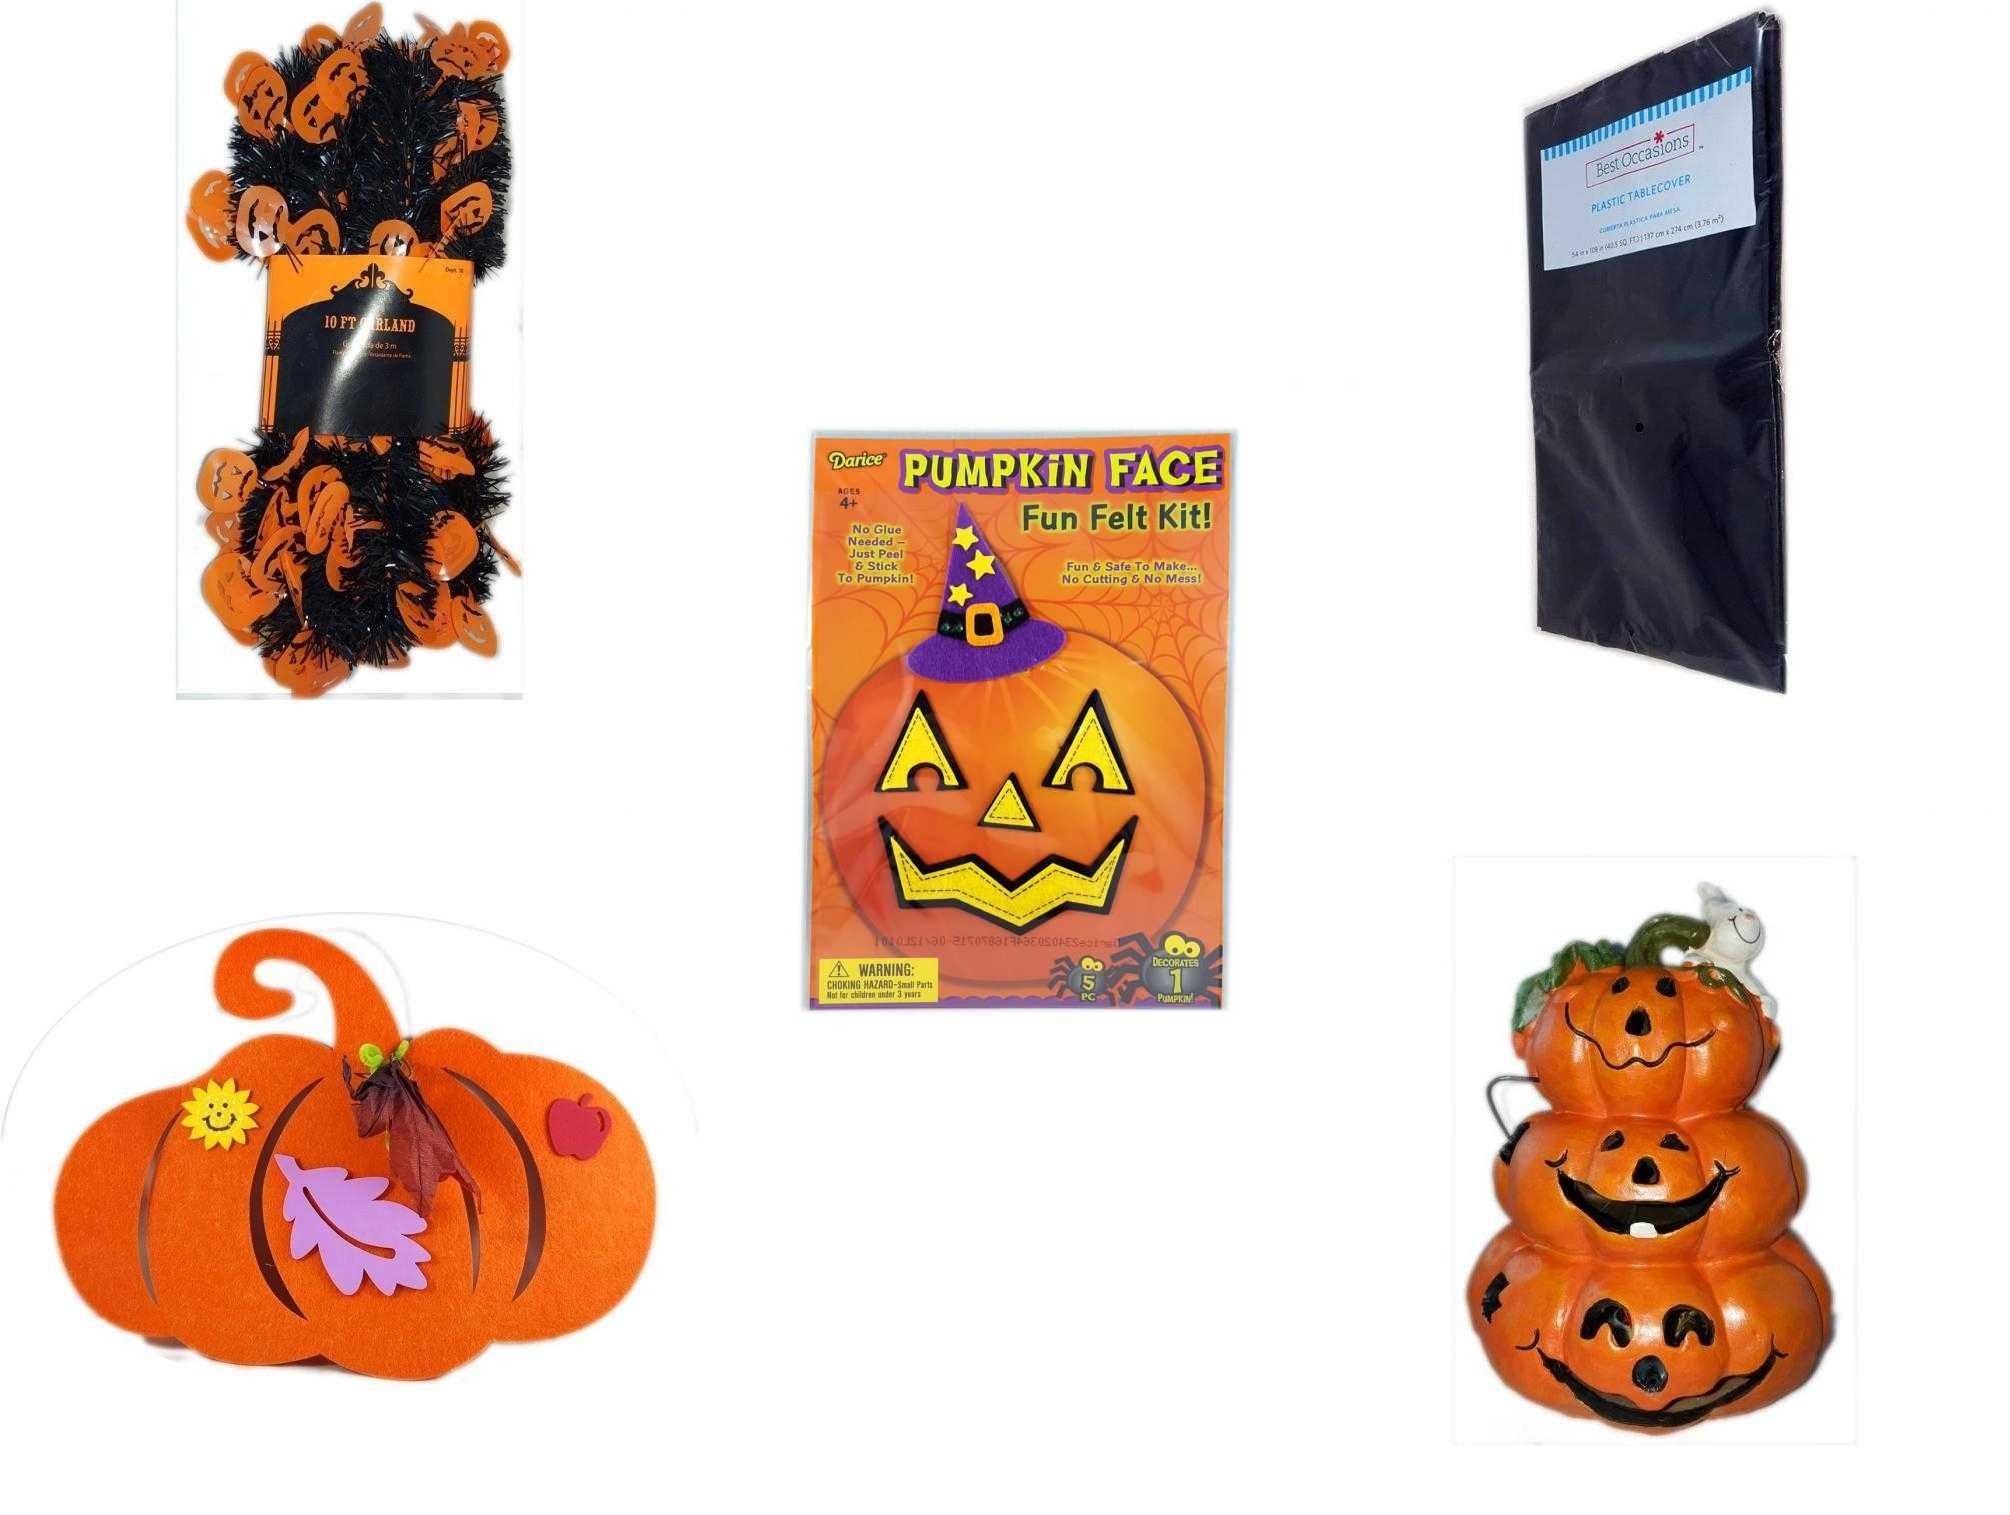 Halloween Fun Gift Bundle 5 Piece Black Orange Pumpkin Garland 10 Ft Black Plastic Table Cover Darice Pumpkin Face Fun Felt Kit Witch Felt Pumpkin Decoration